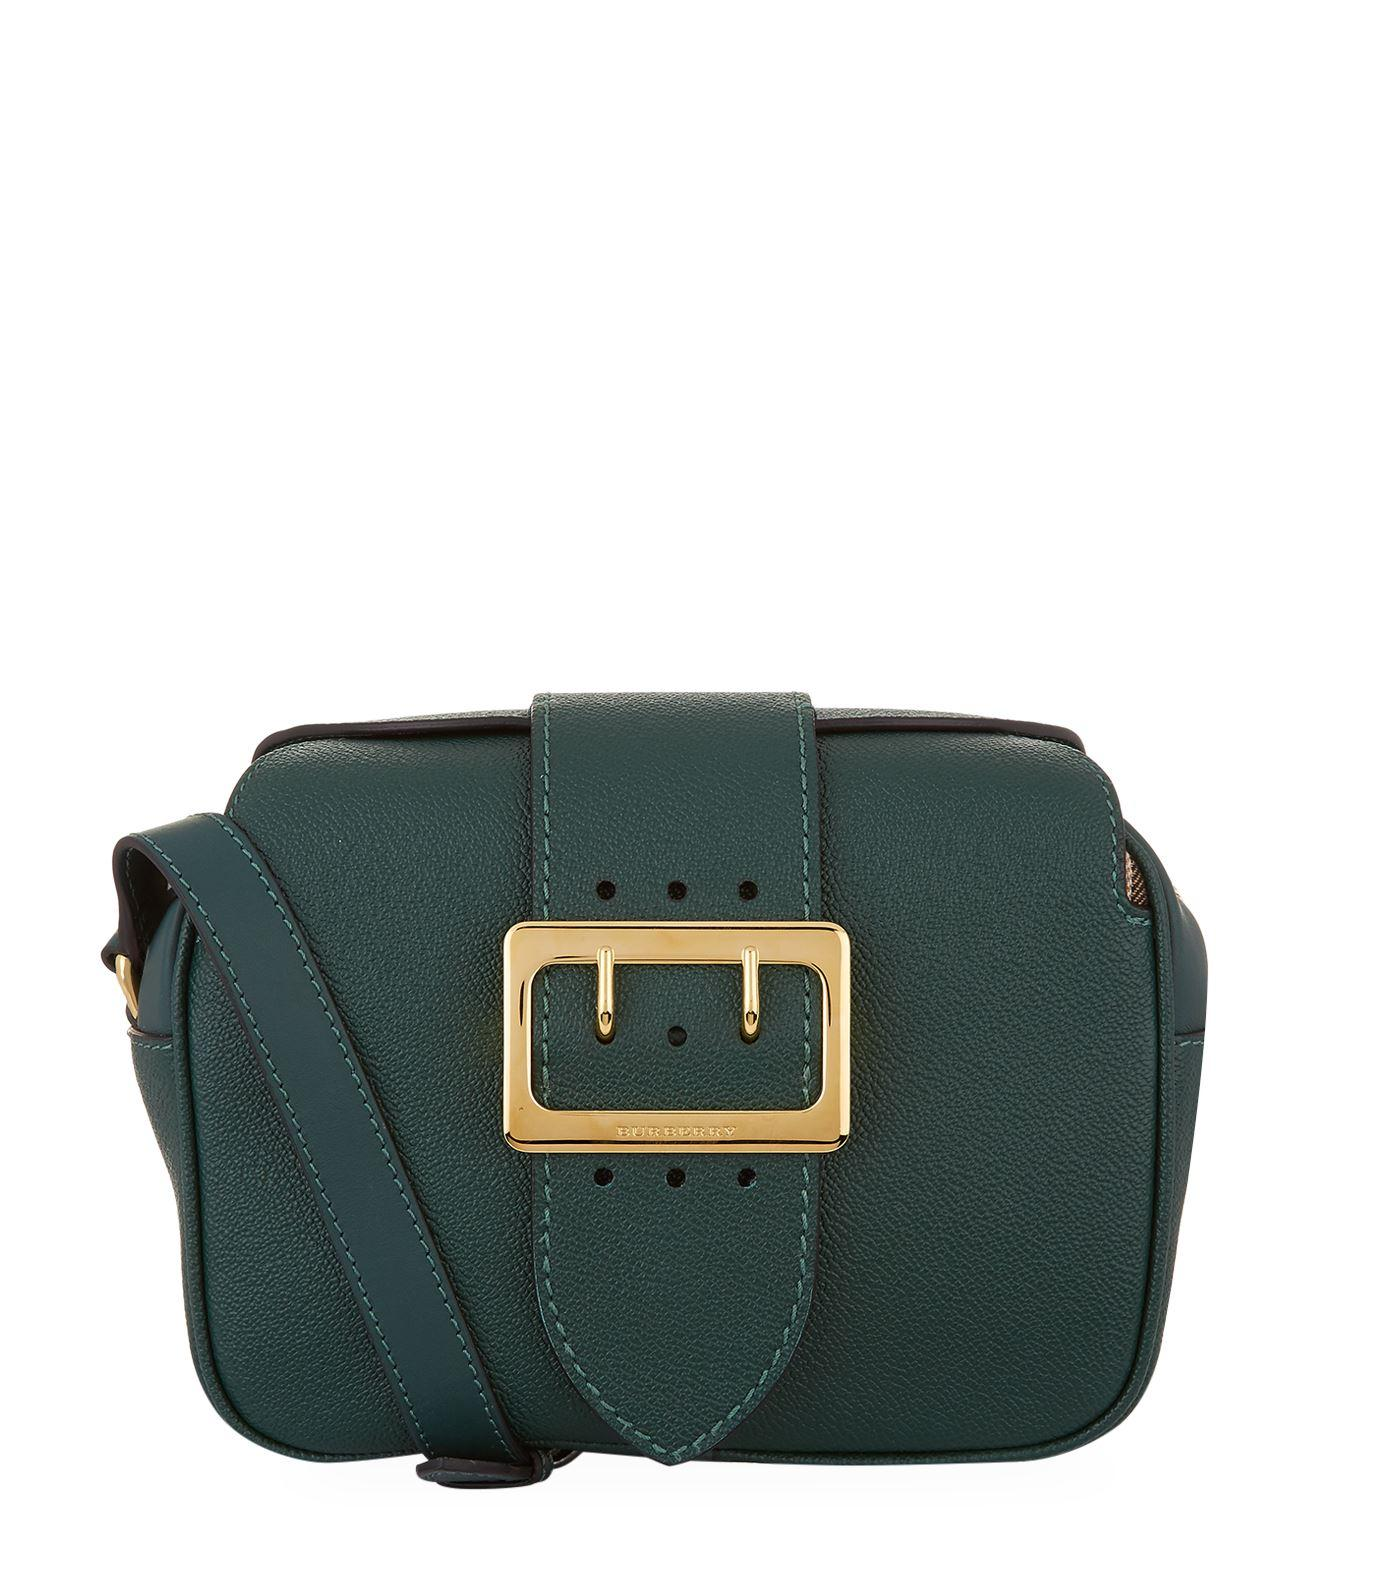 a9eb31ba2972 Burberry Small Buckle Leather Crossbody Bag - Green